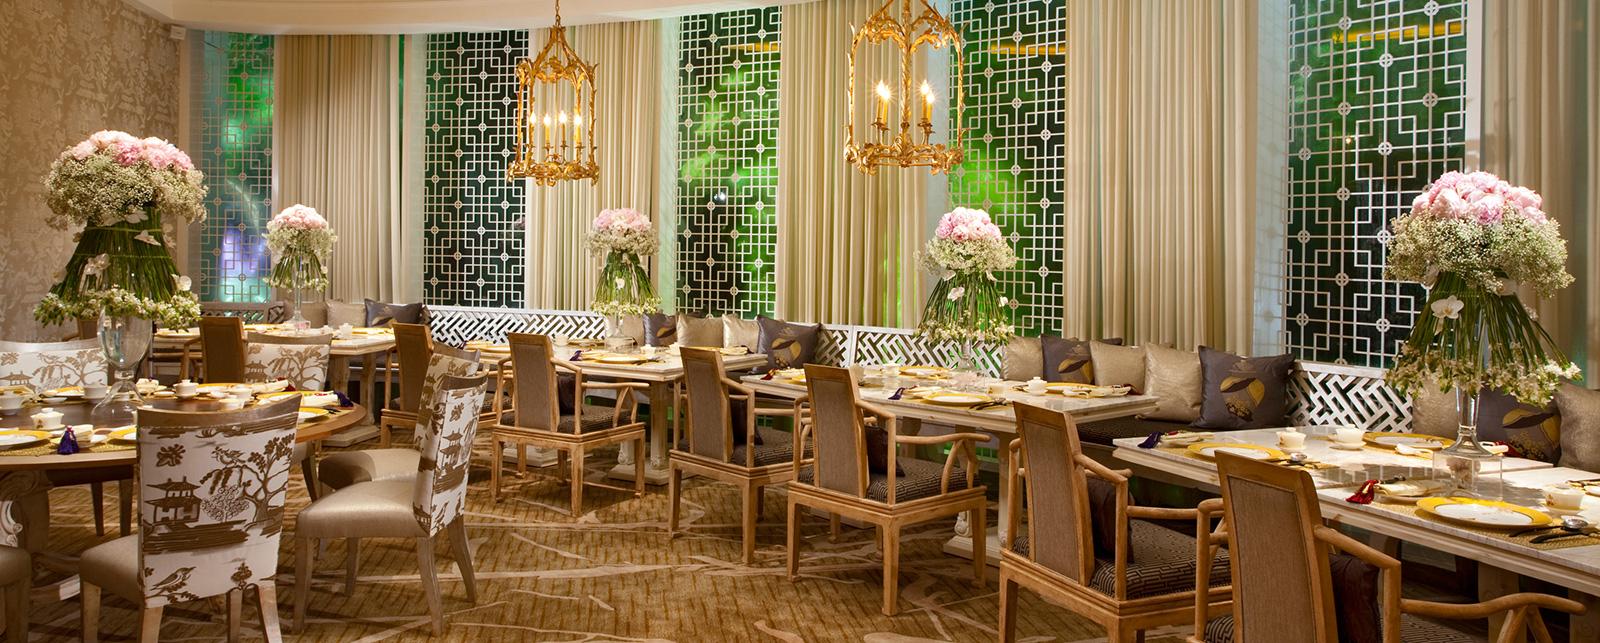 table8_hotel_mulia_jakarta_99.jpg